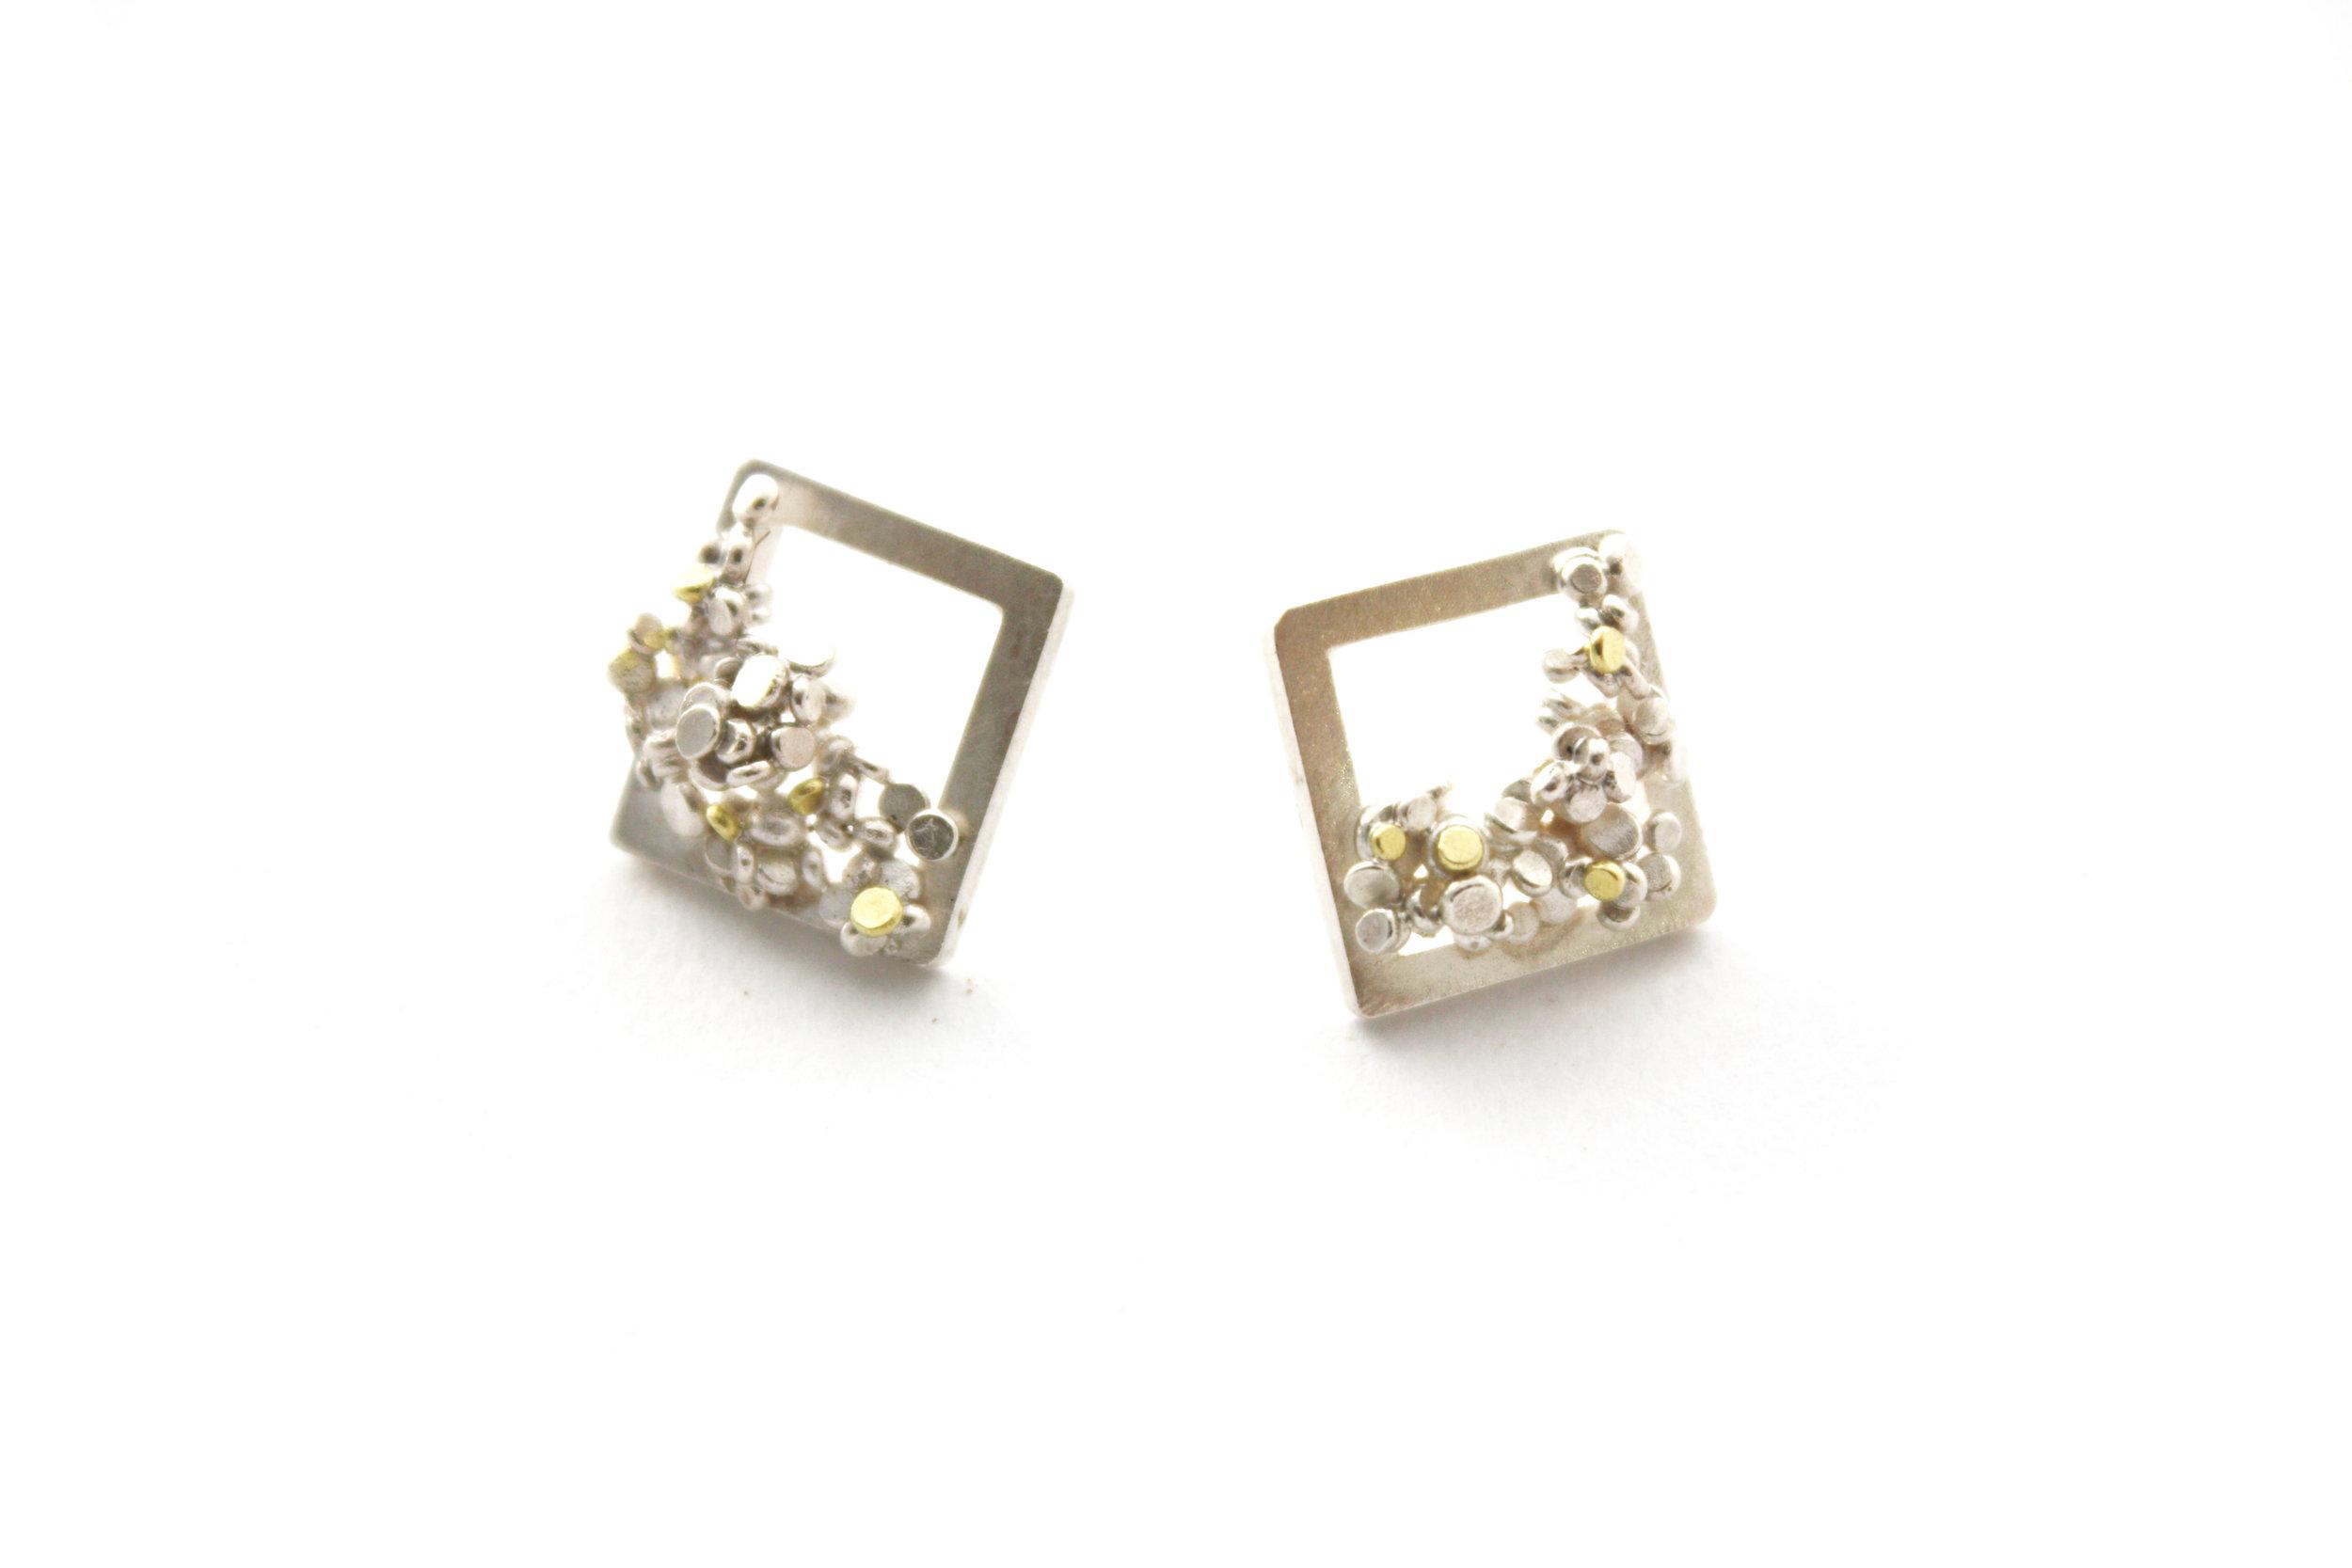 Speckle Frame Earrings